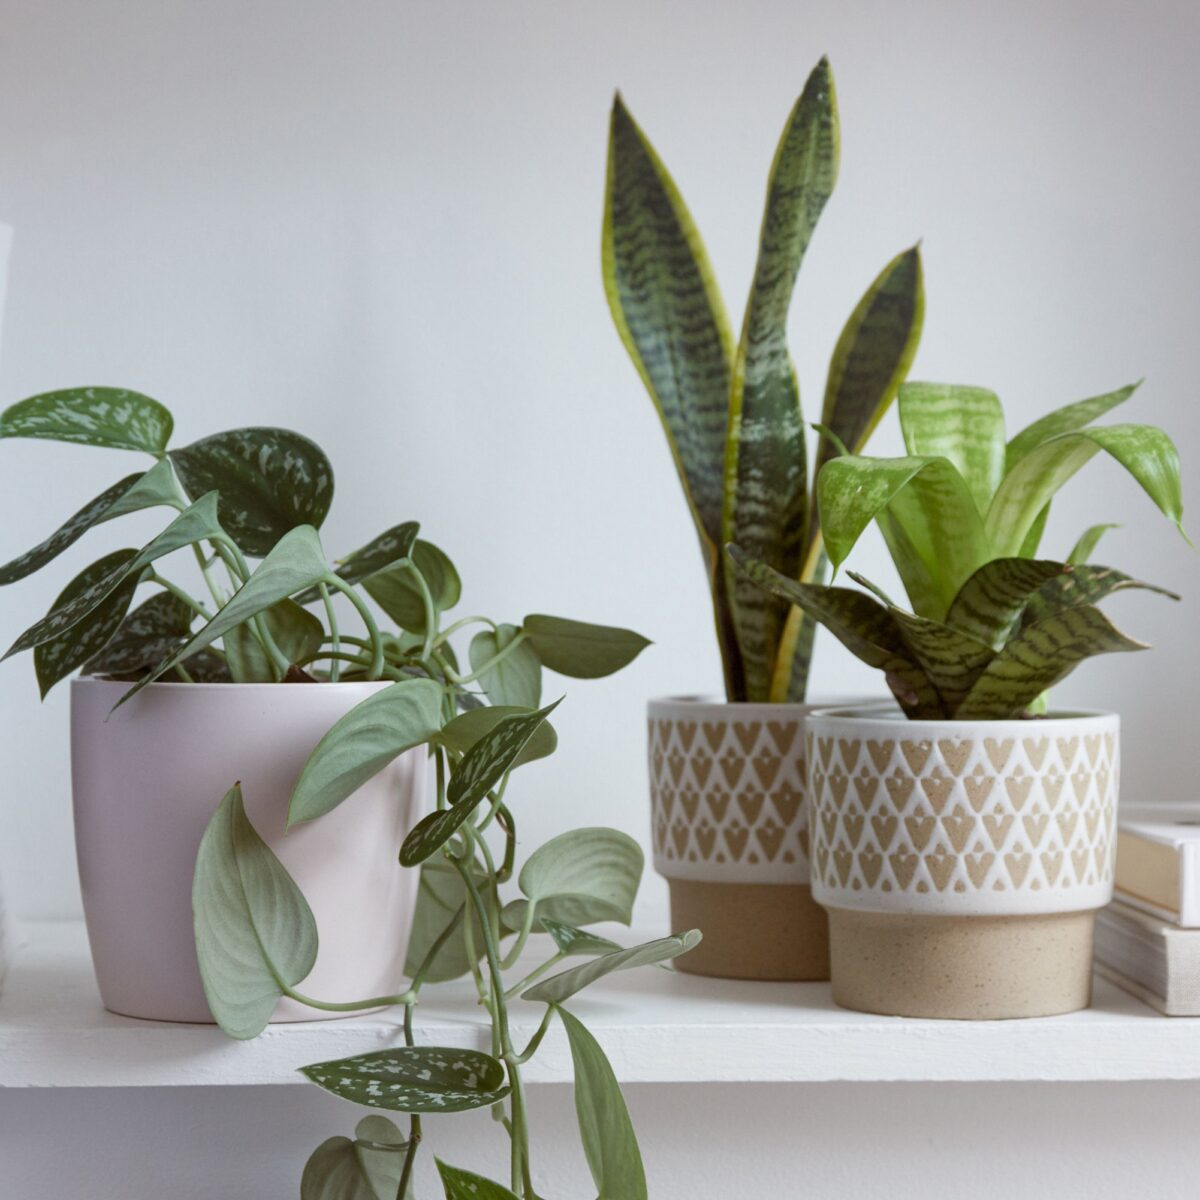 piante-da-avere-casa-novembre-2